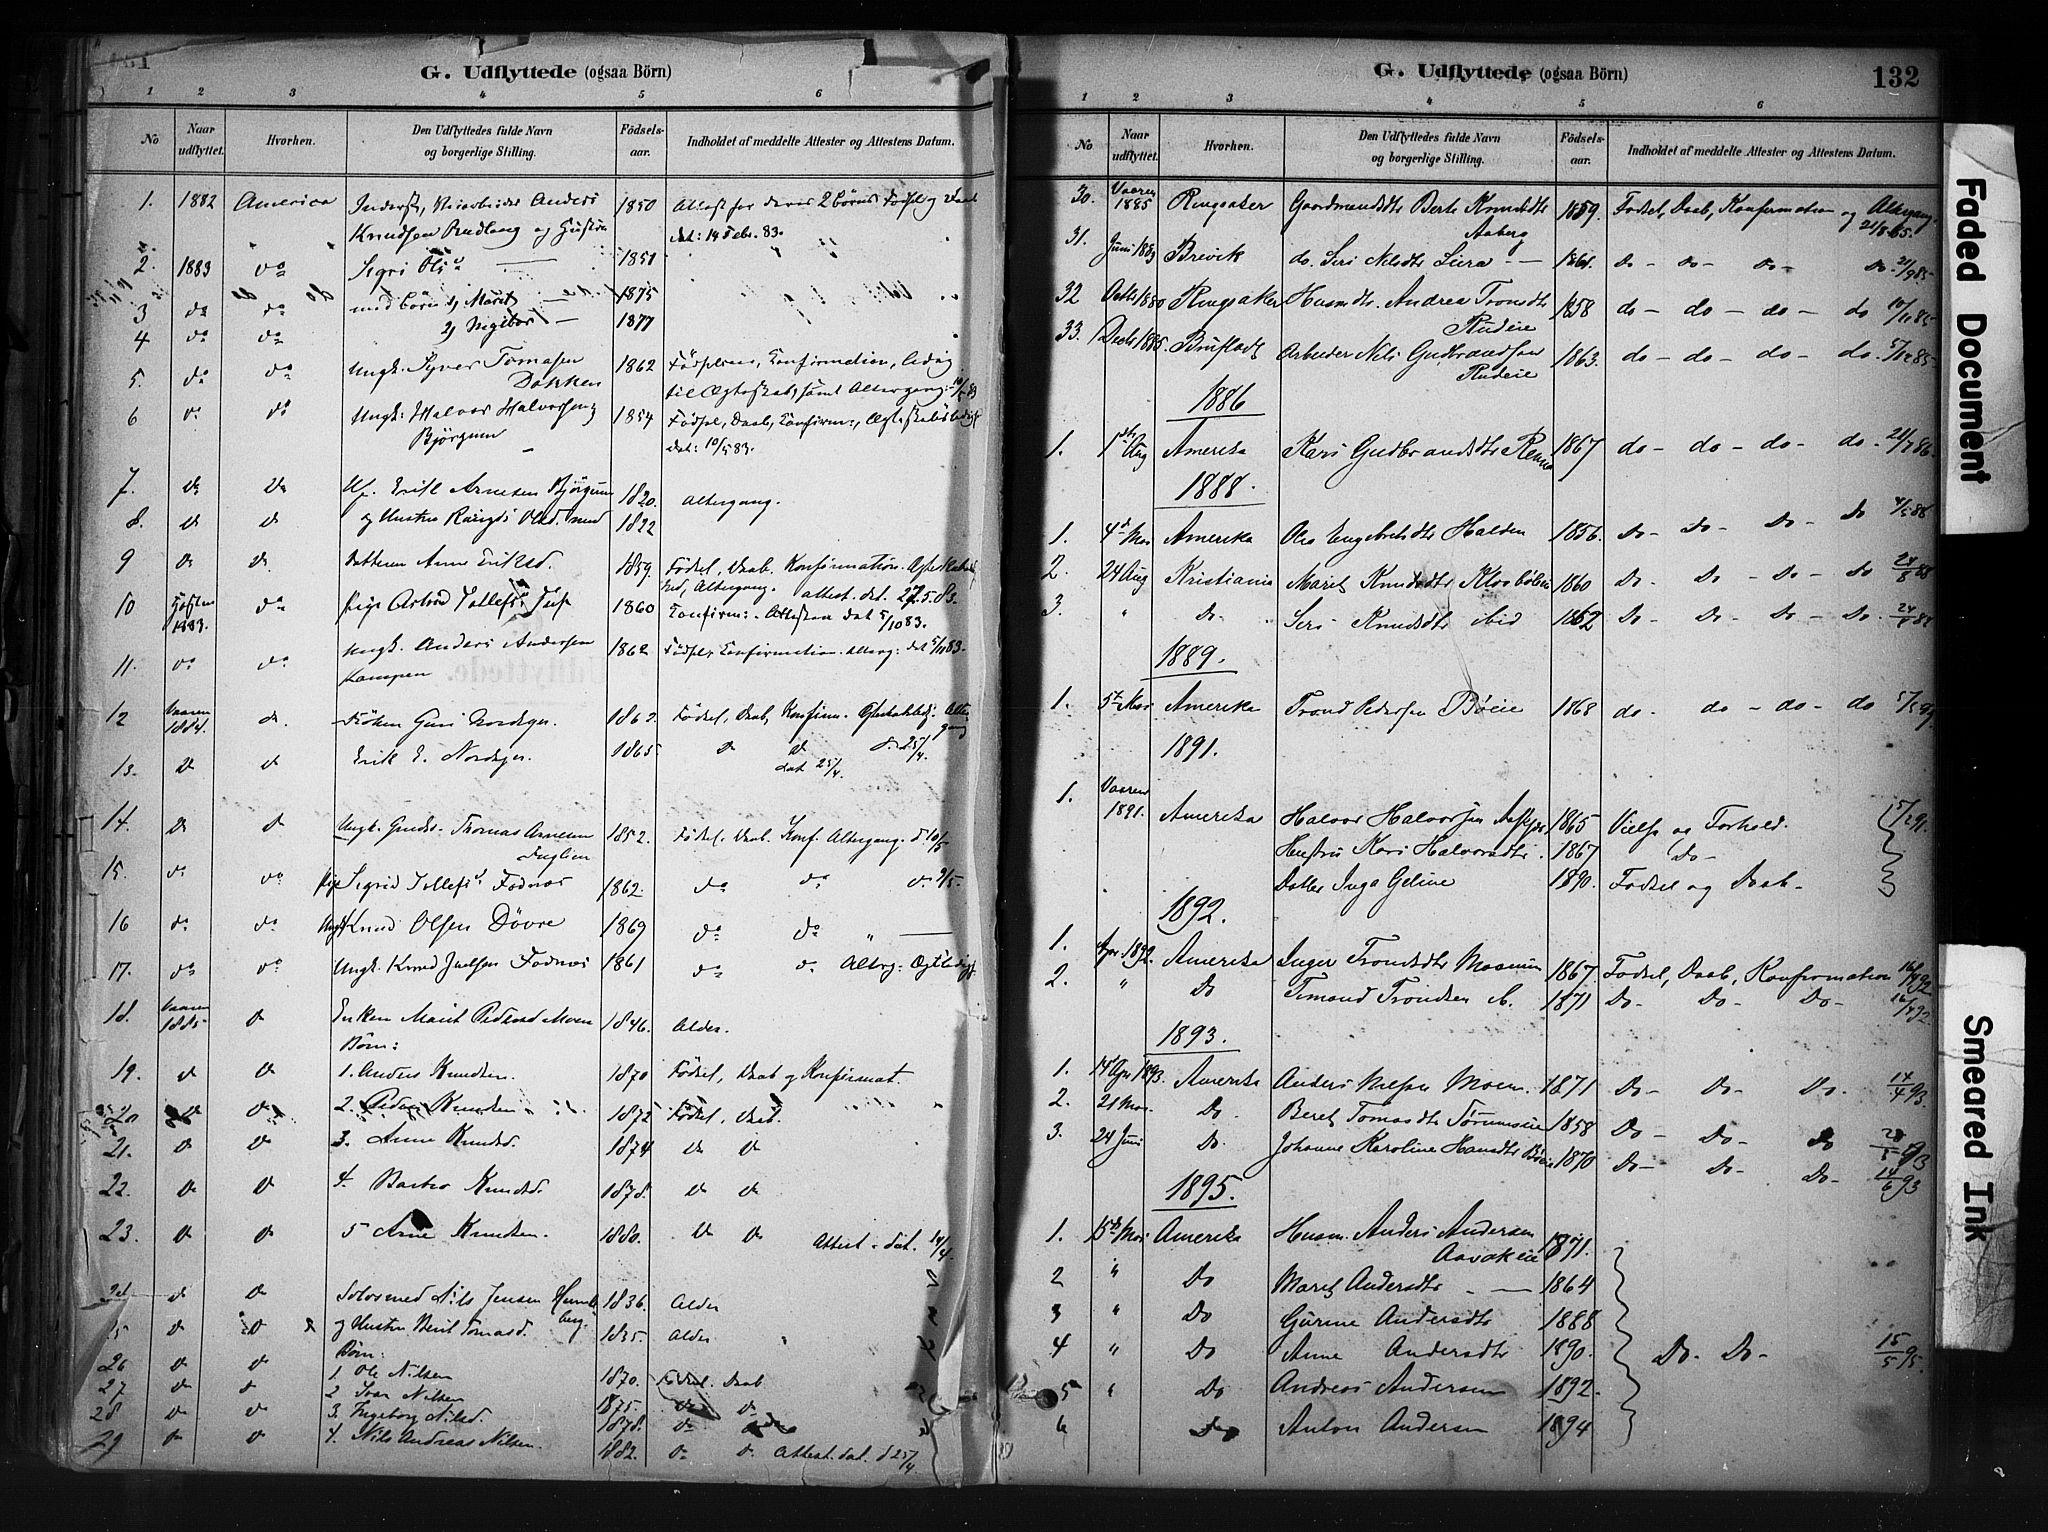 SAH, Nord-Aurdal prestekontor, Ministerialbok nr. 13, 1883-1895, s. 132